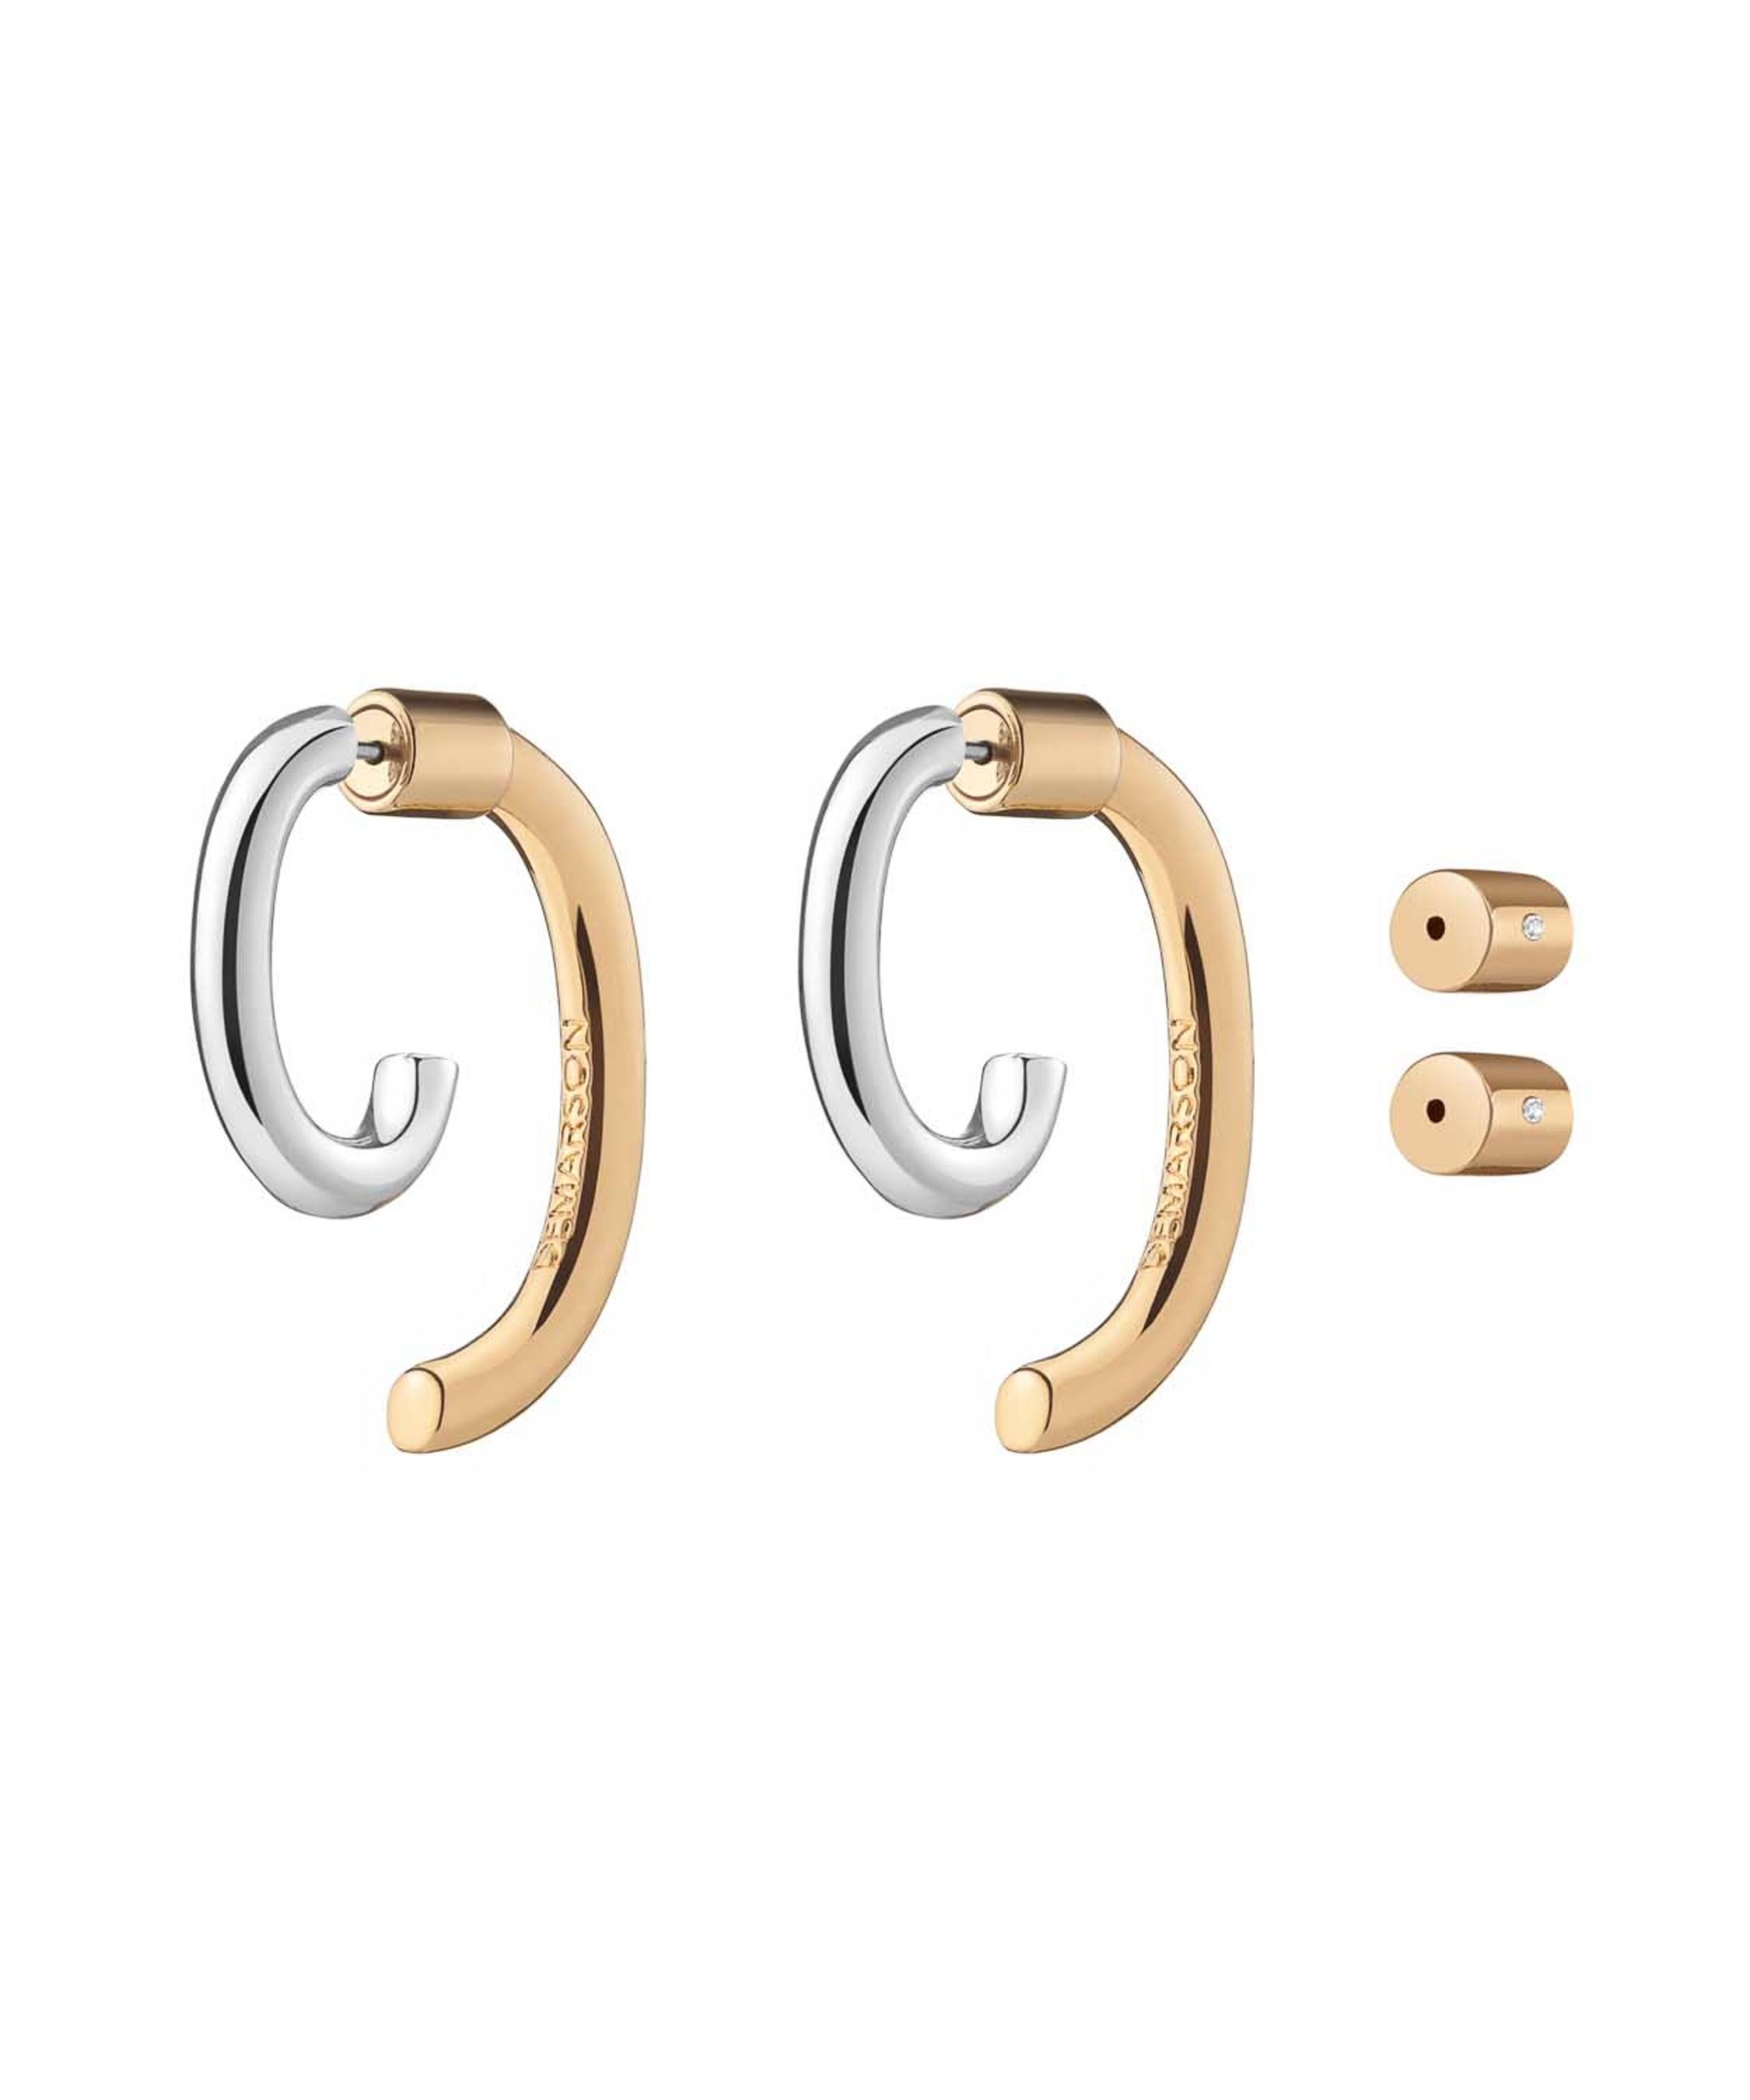 Luna Convertible Two Tone Earrings